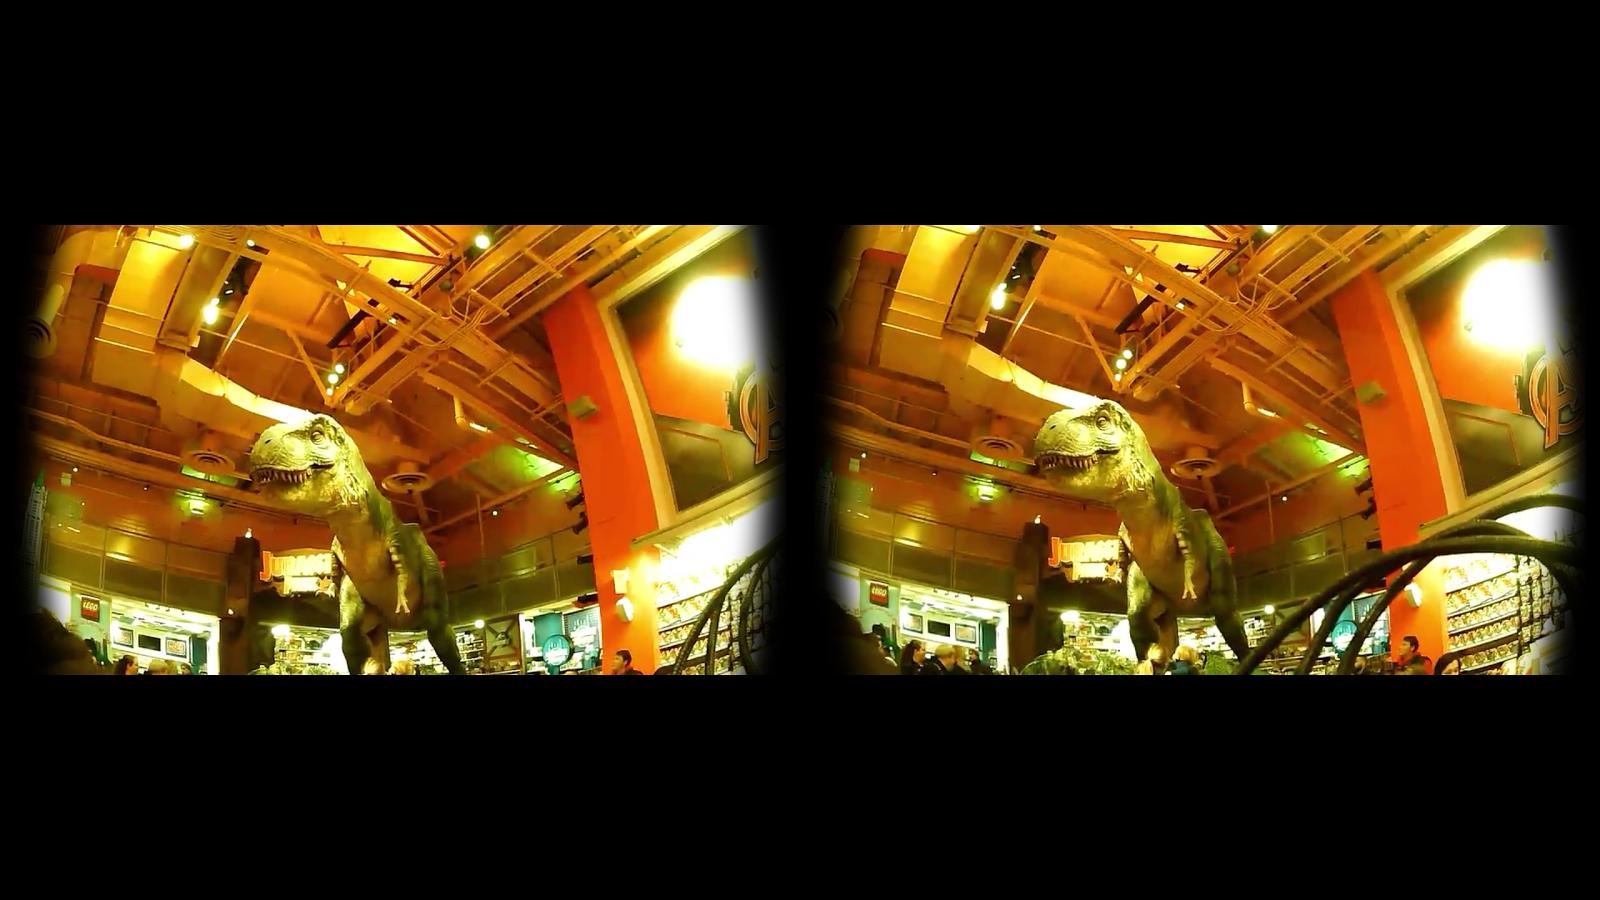 Teleport via Virtual Reality 1 1 4 APK Download - Android Media